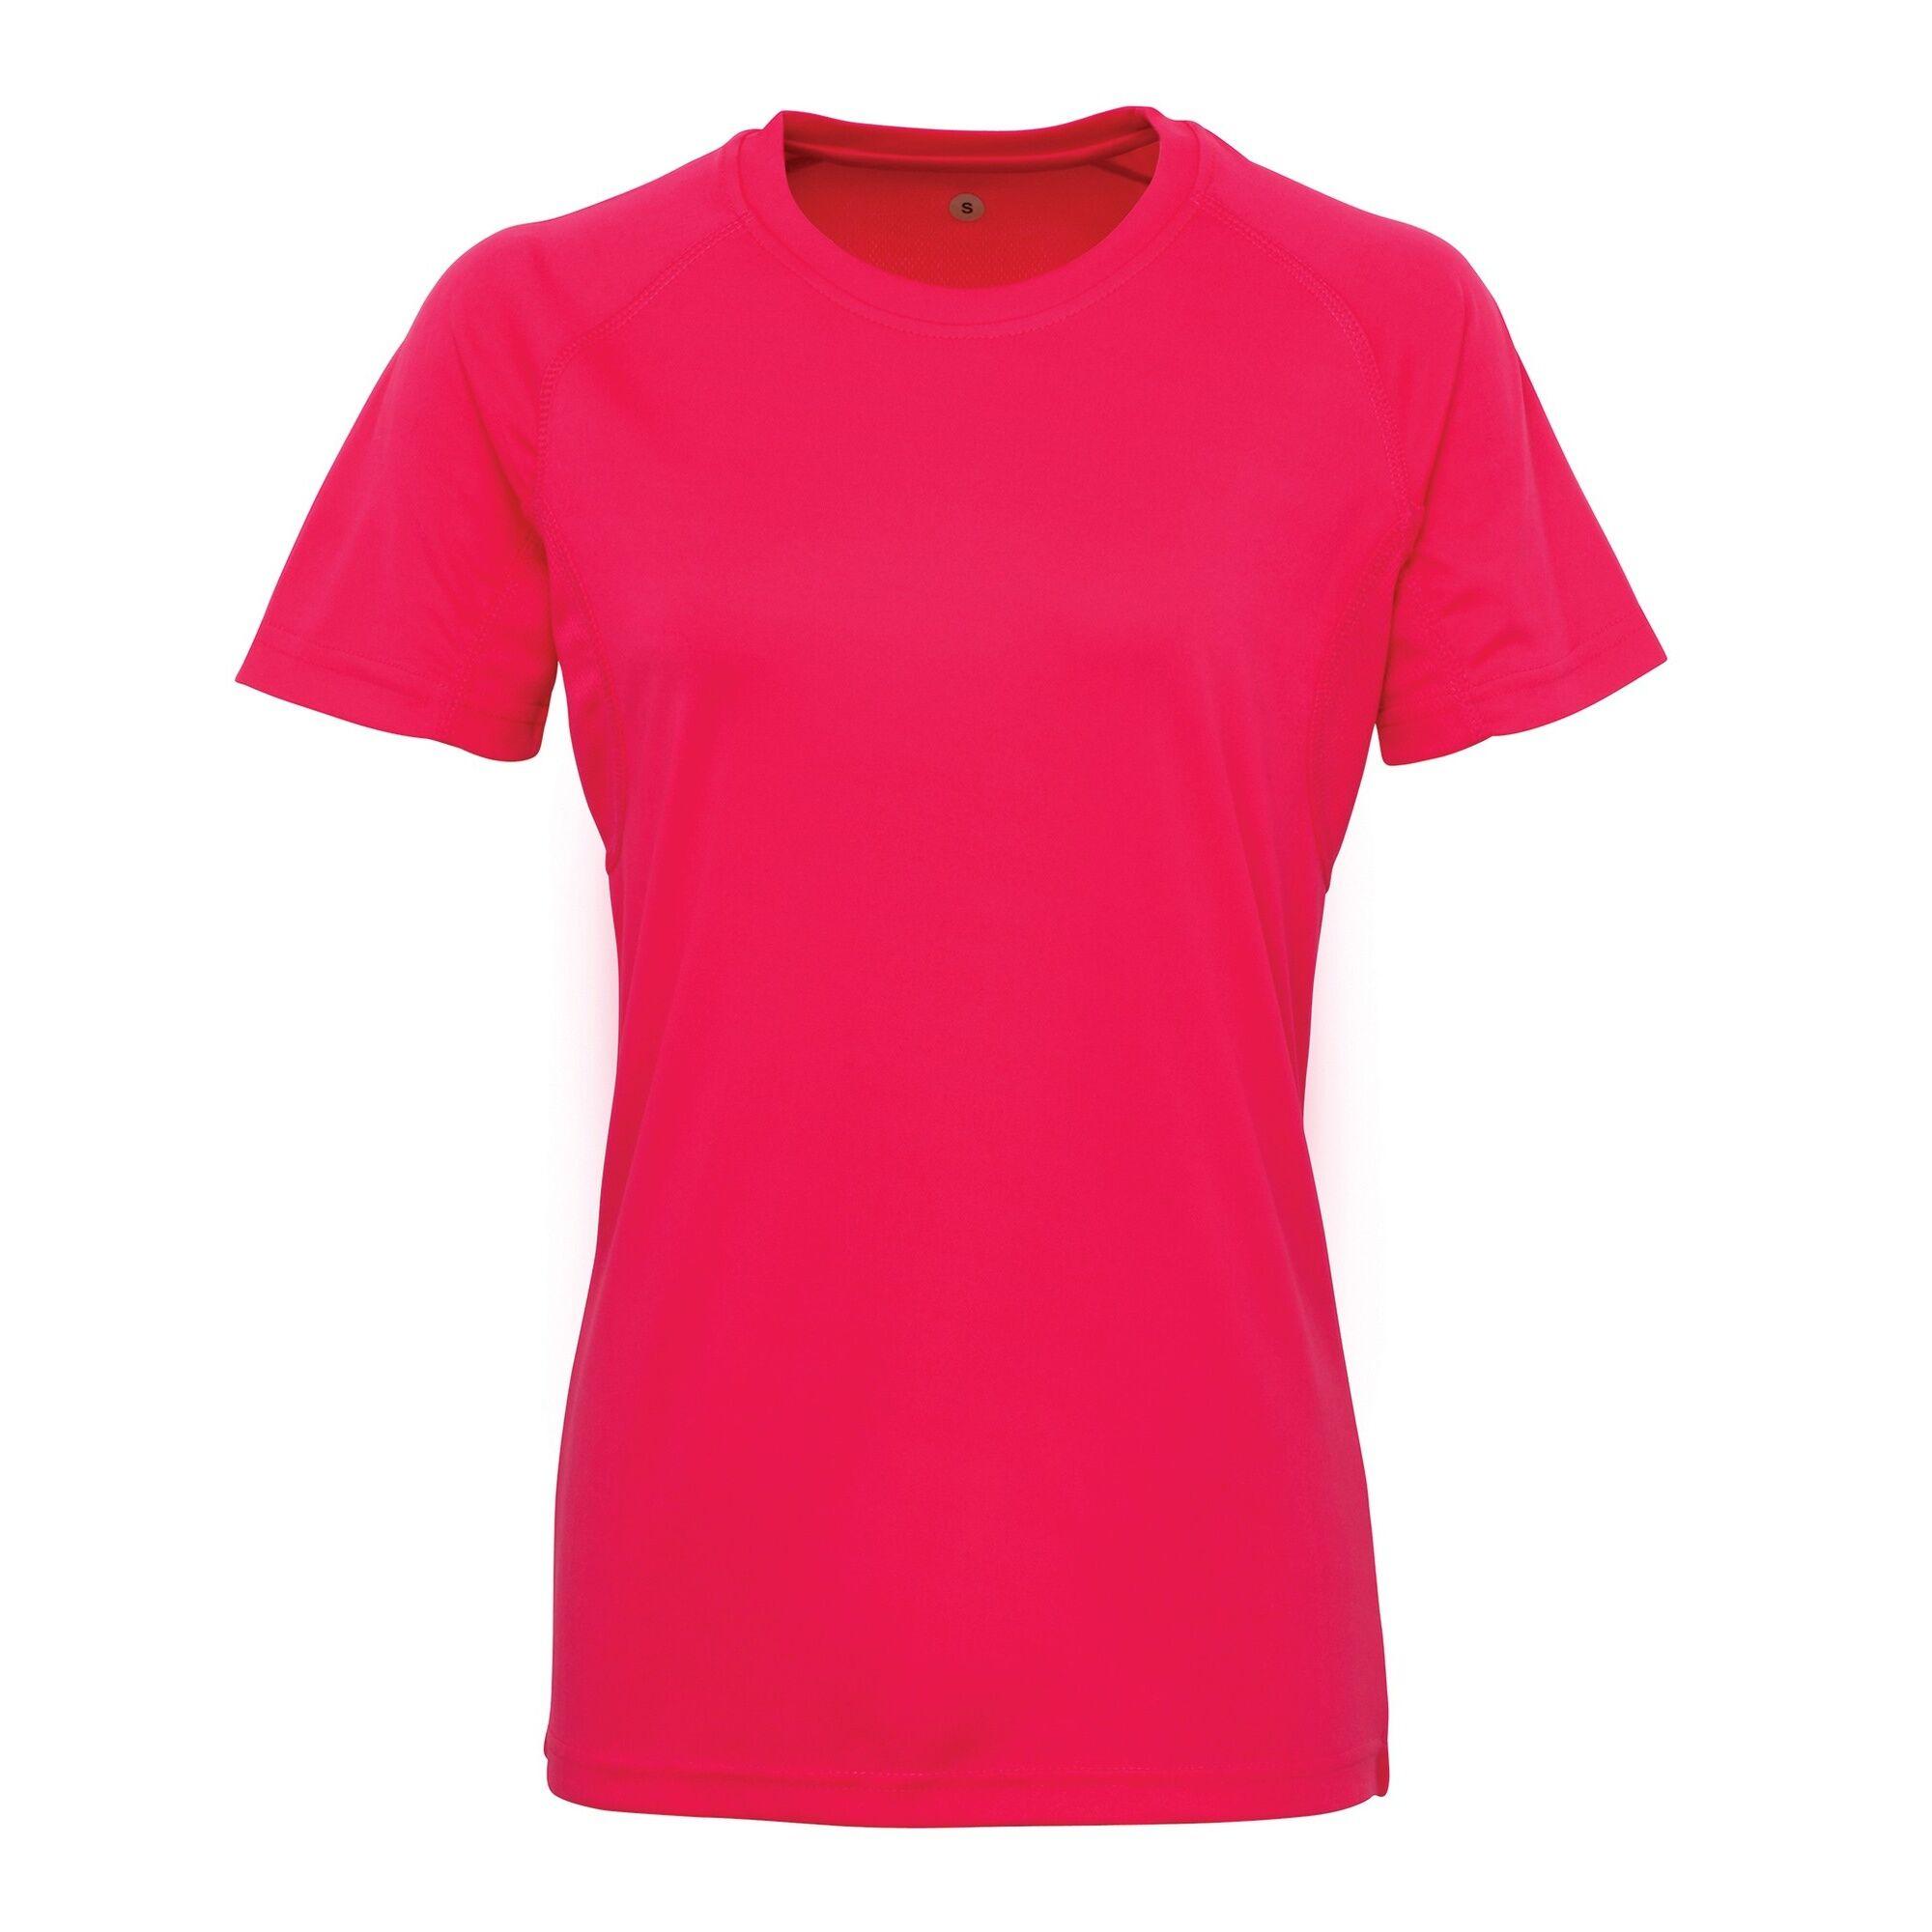 Tri Dri - T-Shirt À Manches Courtes - Femme (Rose) - UTRW4852